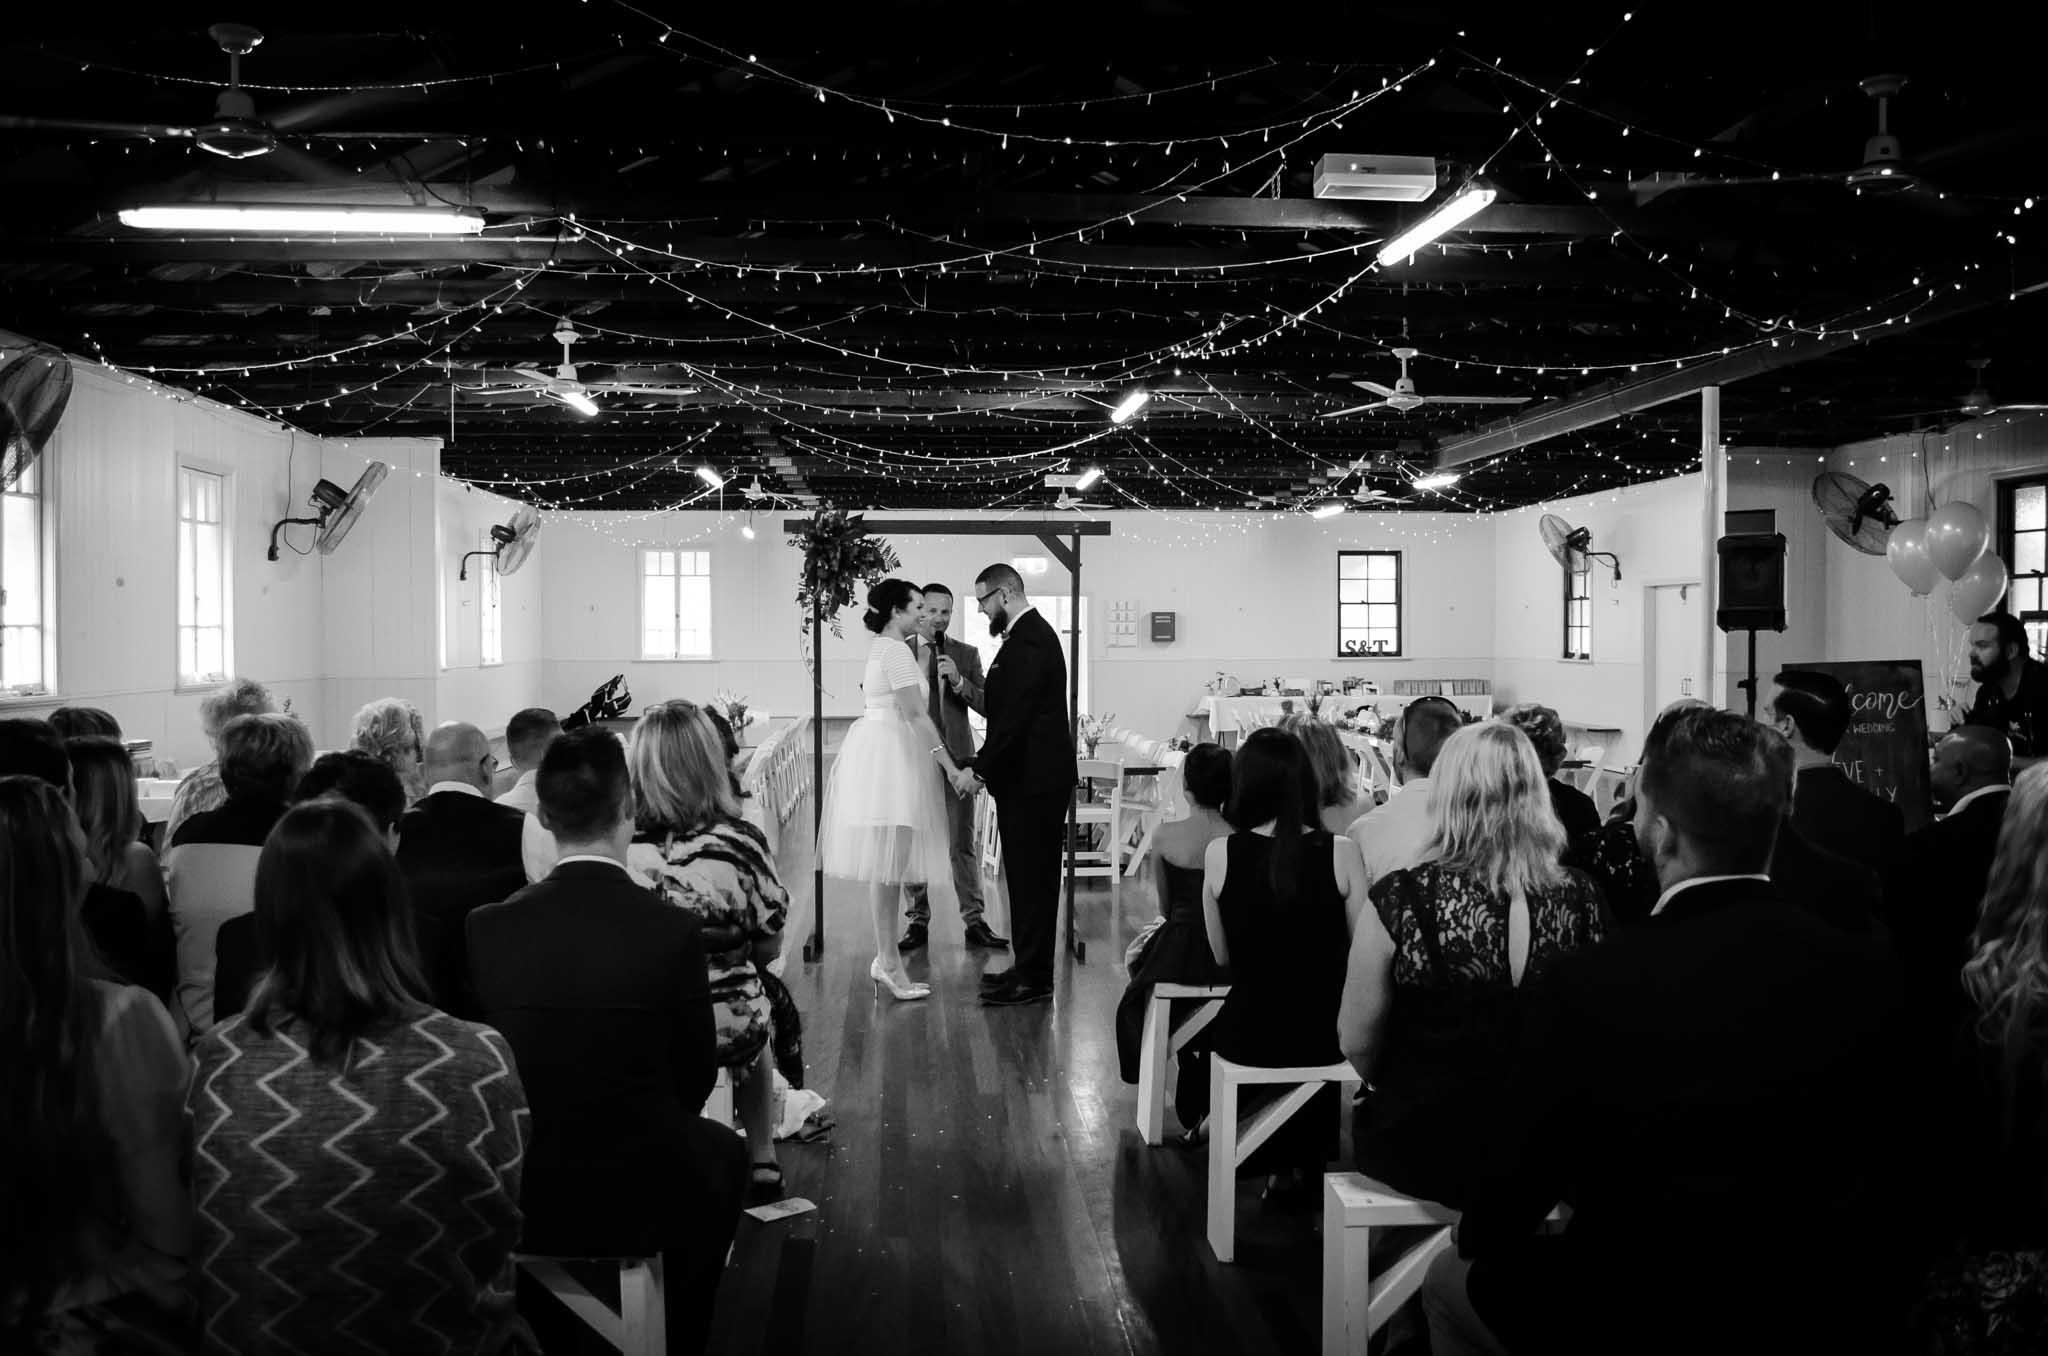 Stephen & Tilly - Samford, Queensland